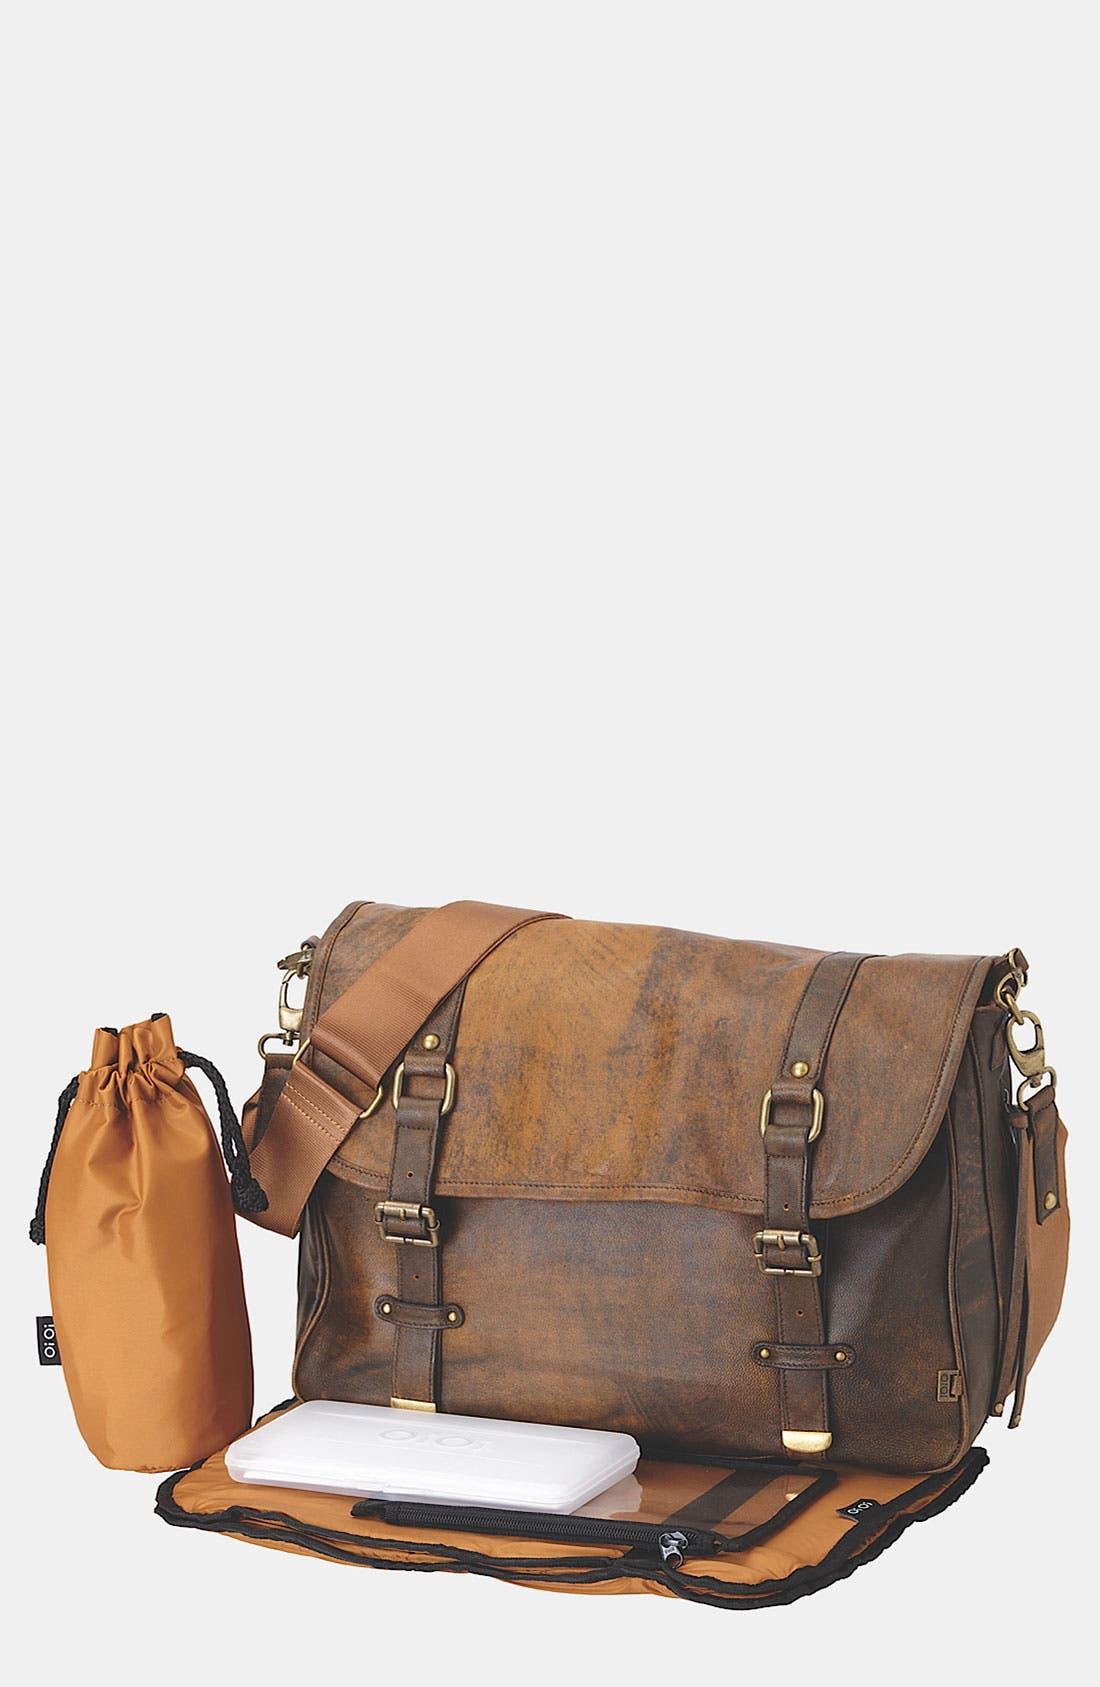 Alternate Image 1 Selected - OiOi 'Jungle' Leather Diaper Bag